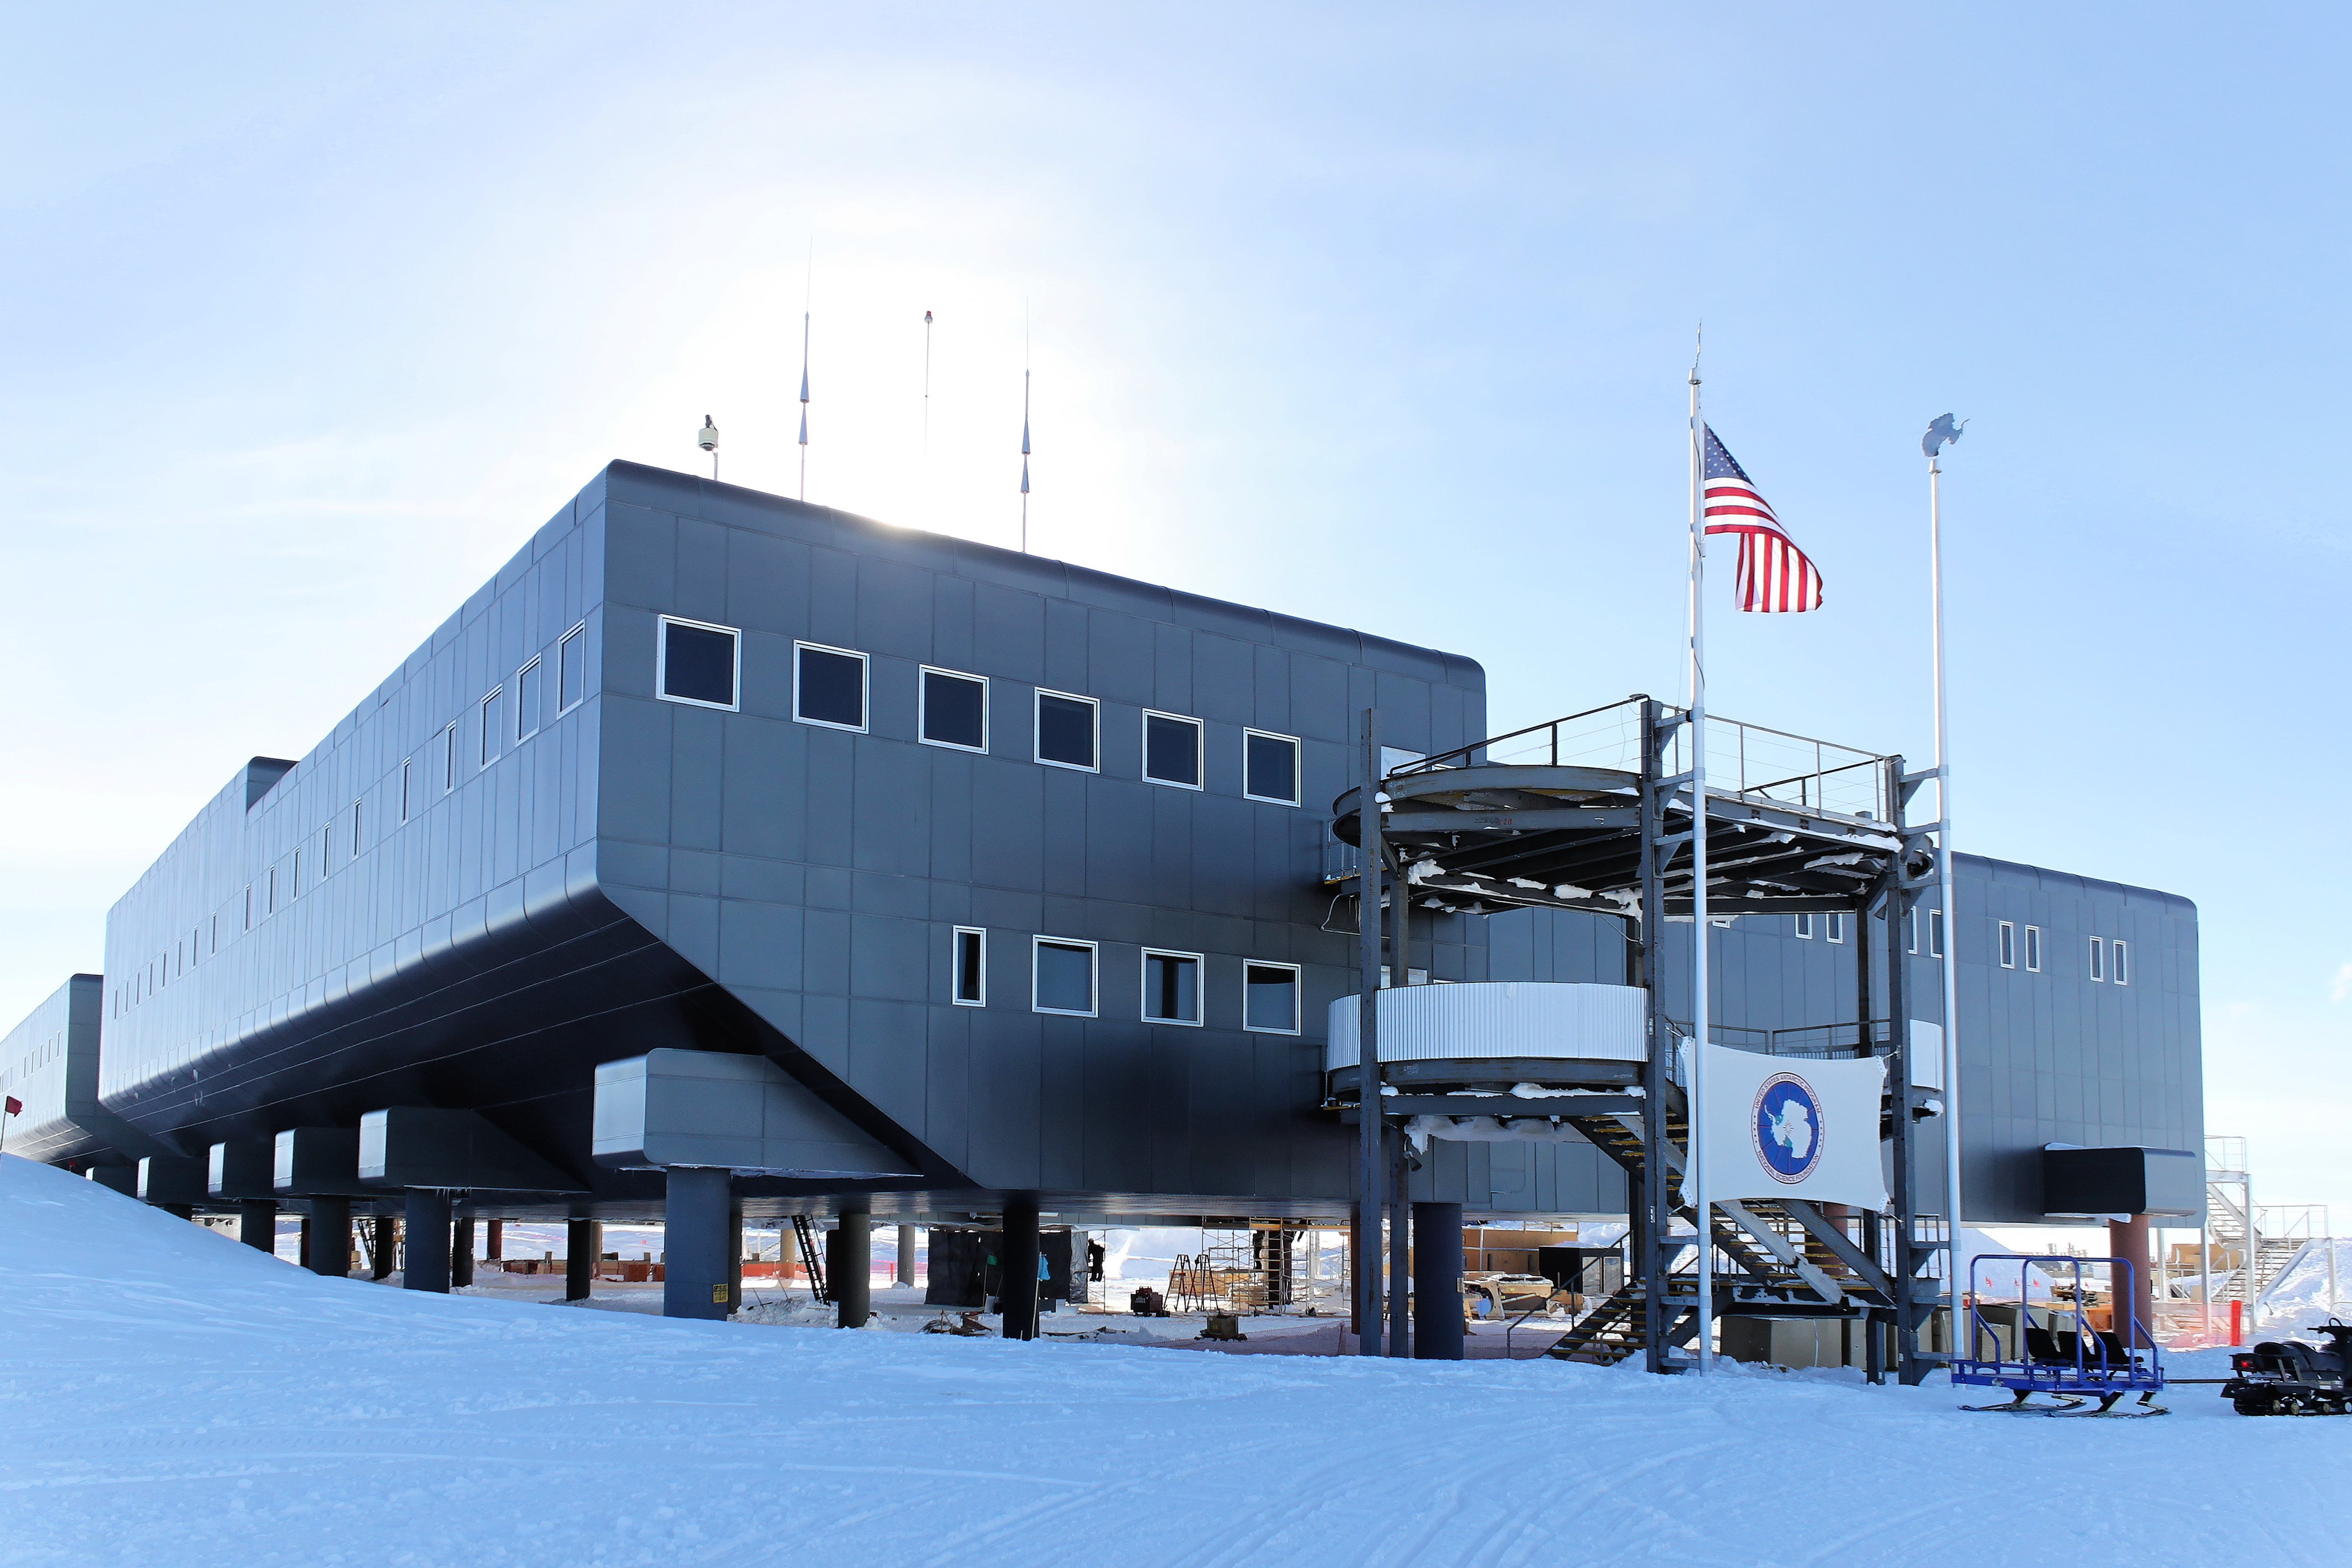 Amundsen–Scott South Pole Station - Wikipedia